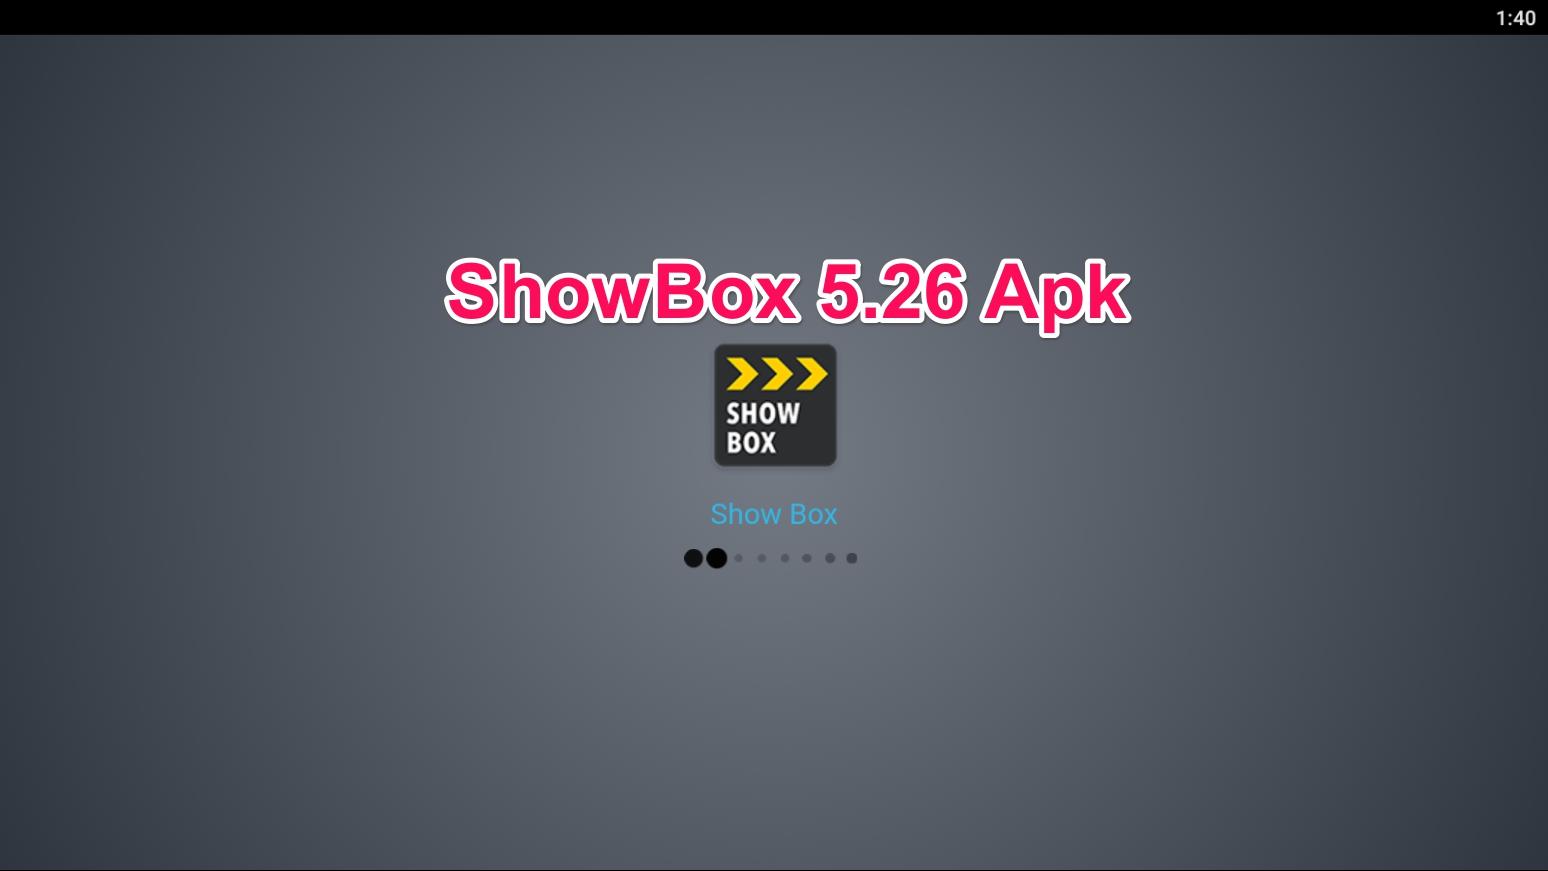 Latest Showbox 5 26 Apk, Download January 2019 version on